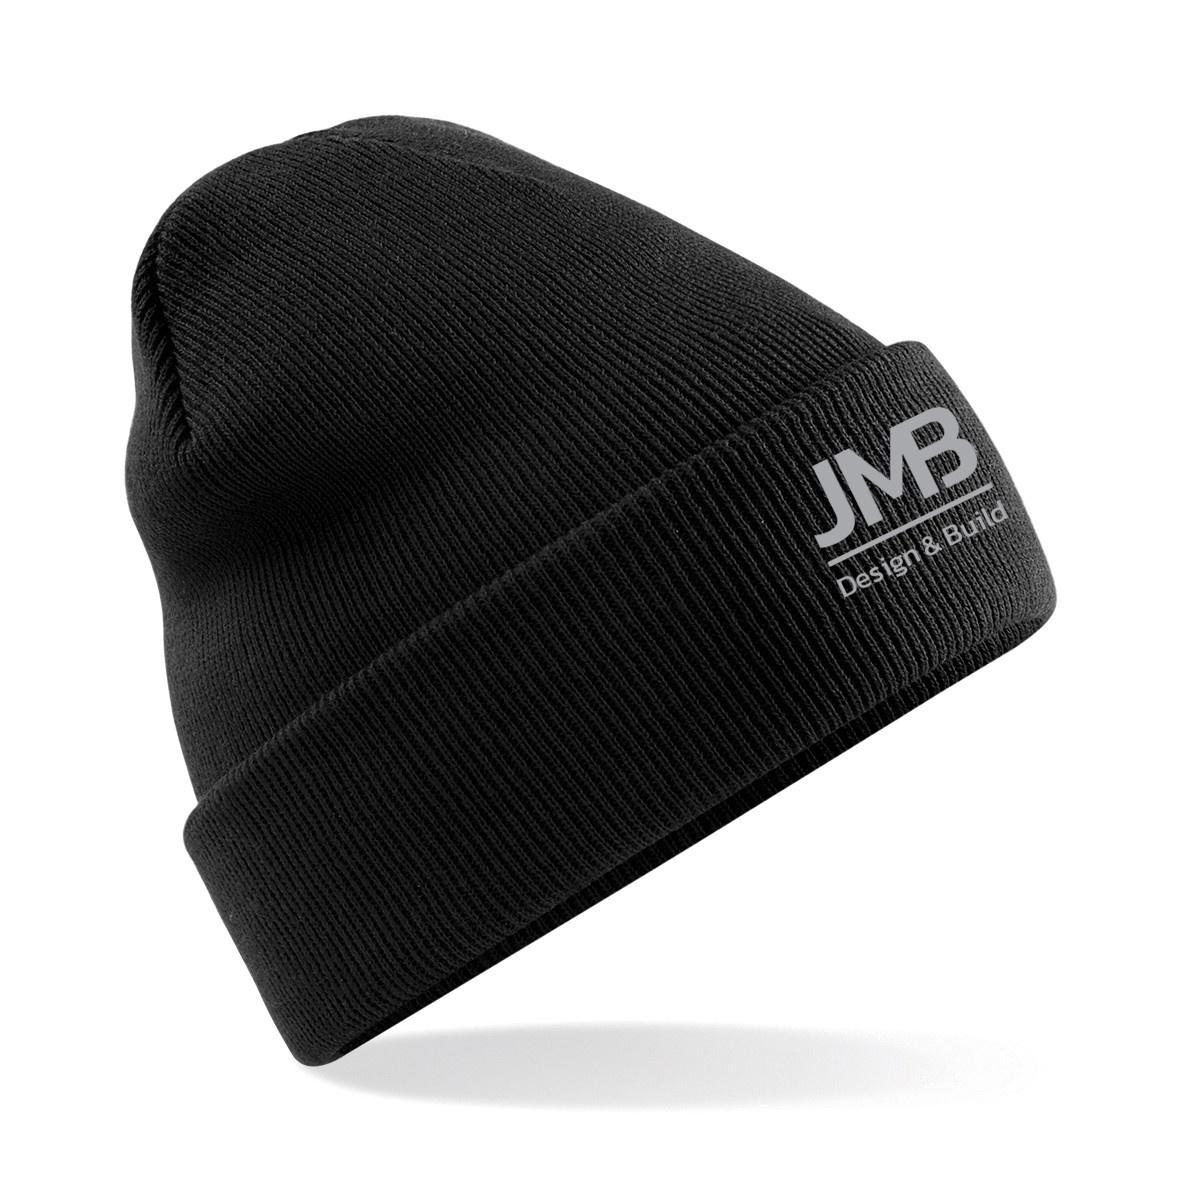 JMB Adults Knitted Turn Up Beanie